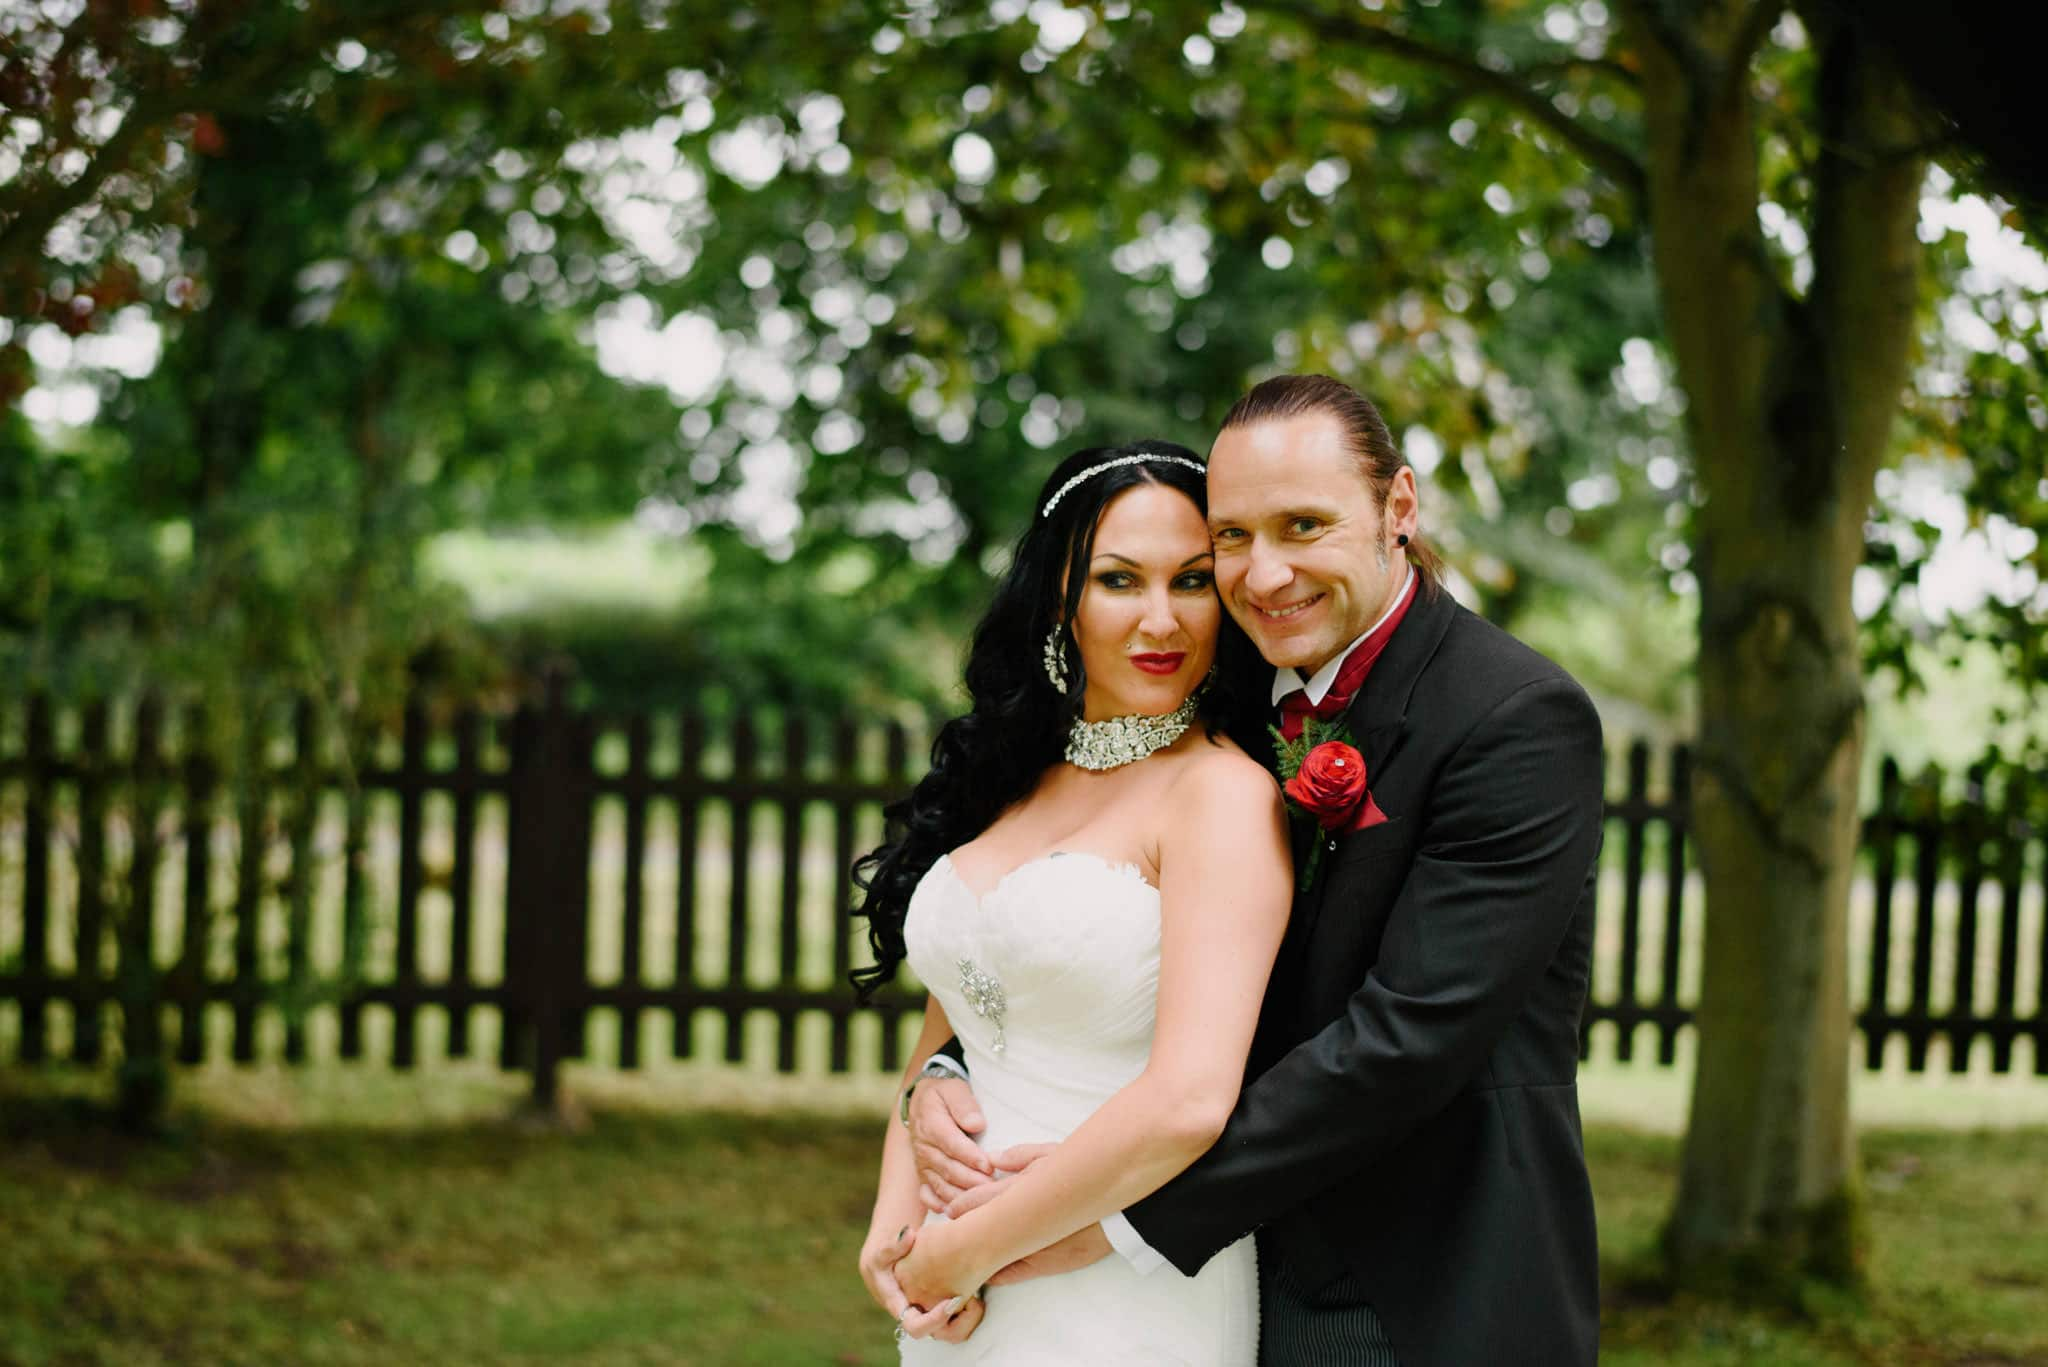 Caroline & Gus - Second Shooting an Essex Wedding 13